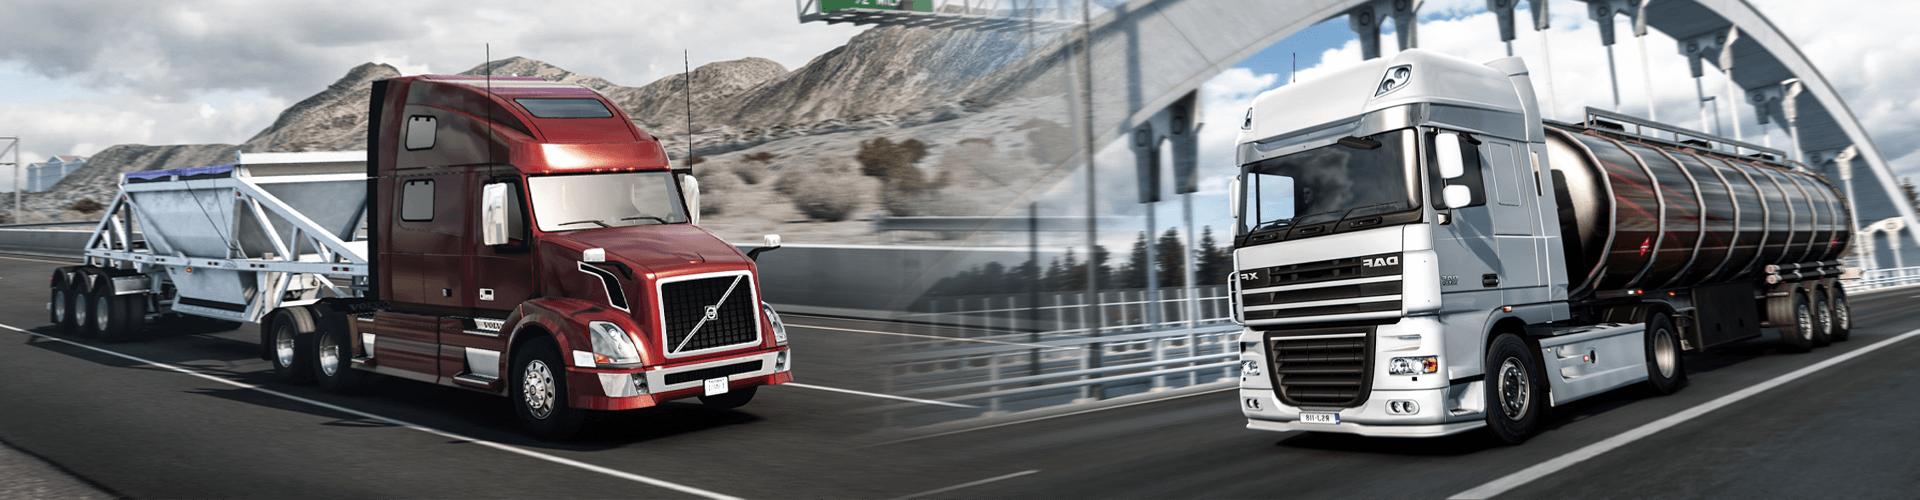 TruckersMP 7 Year Anniversary – Events